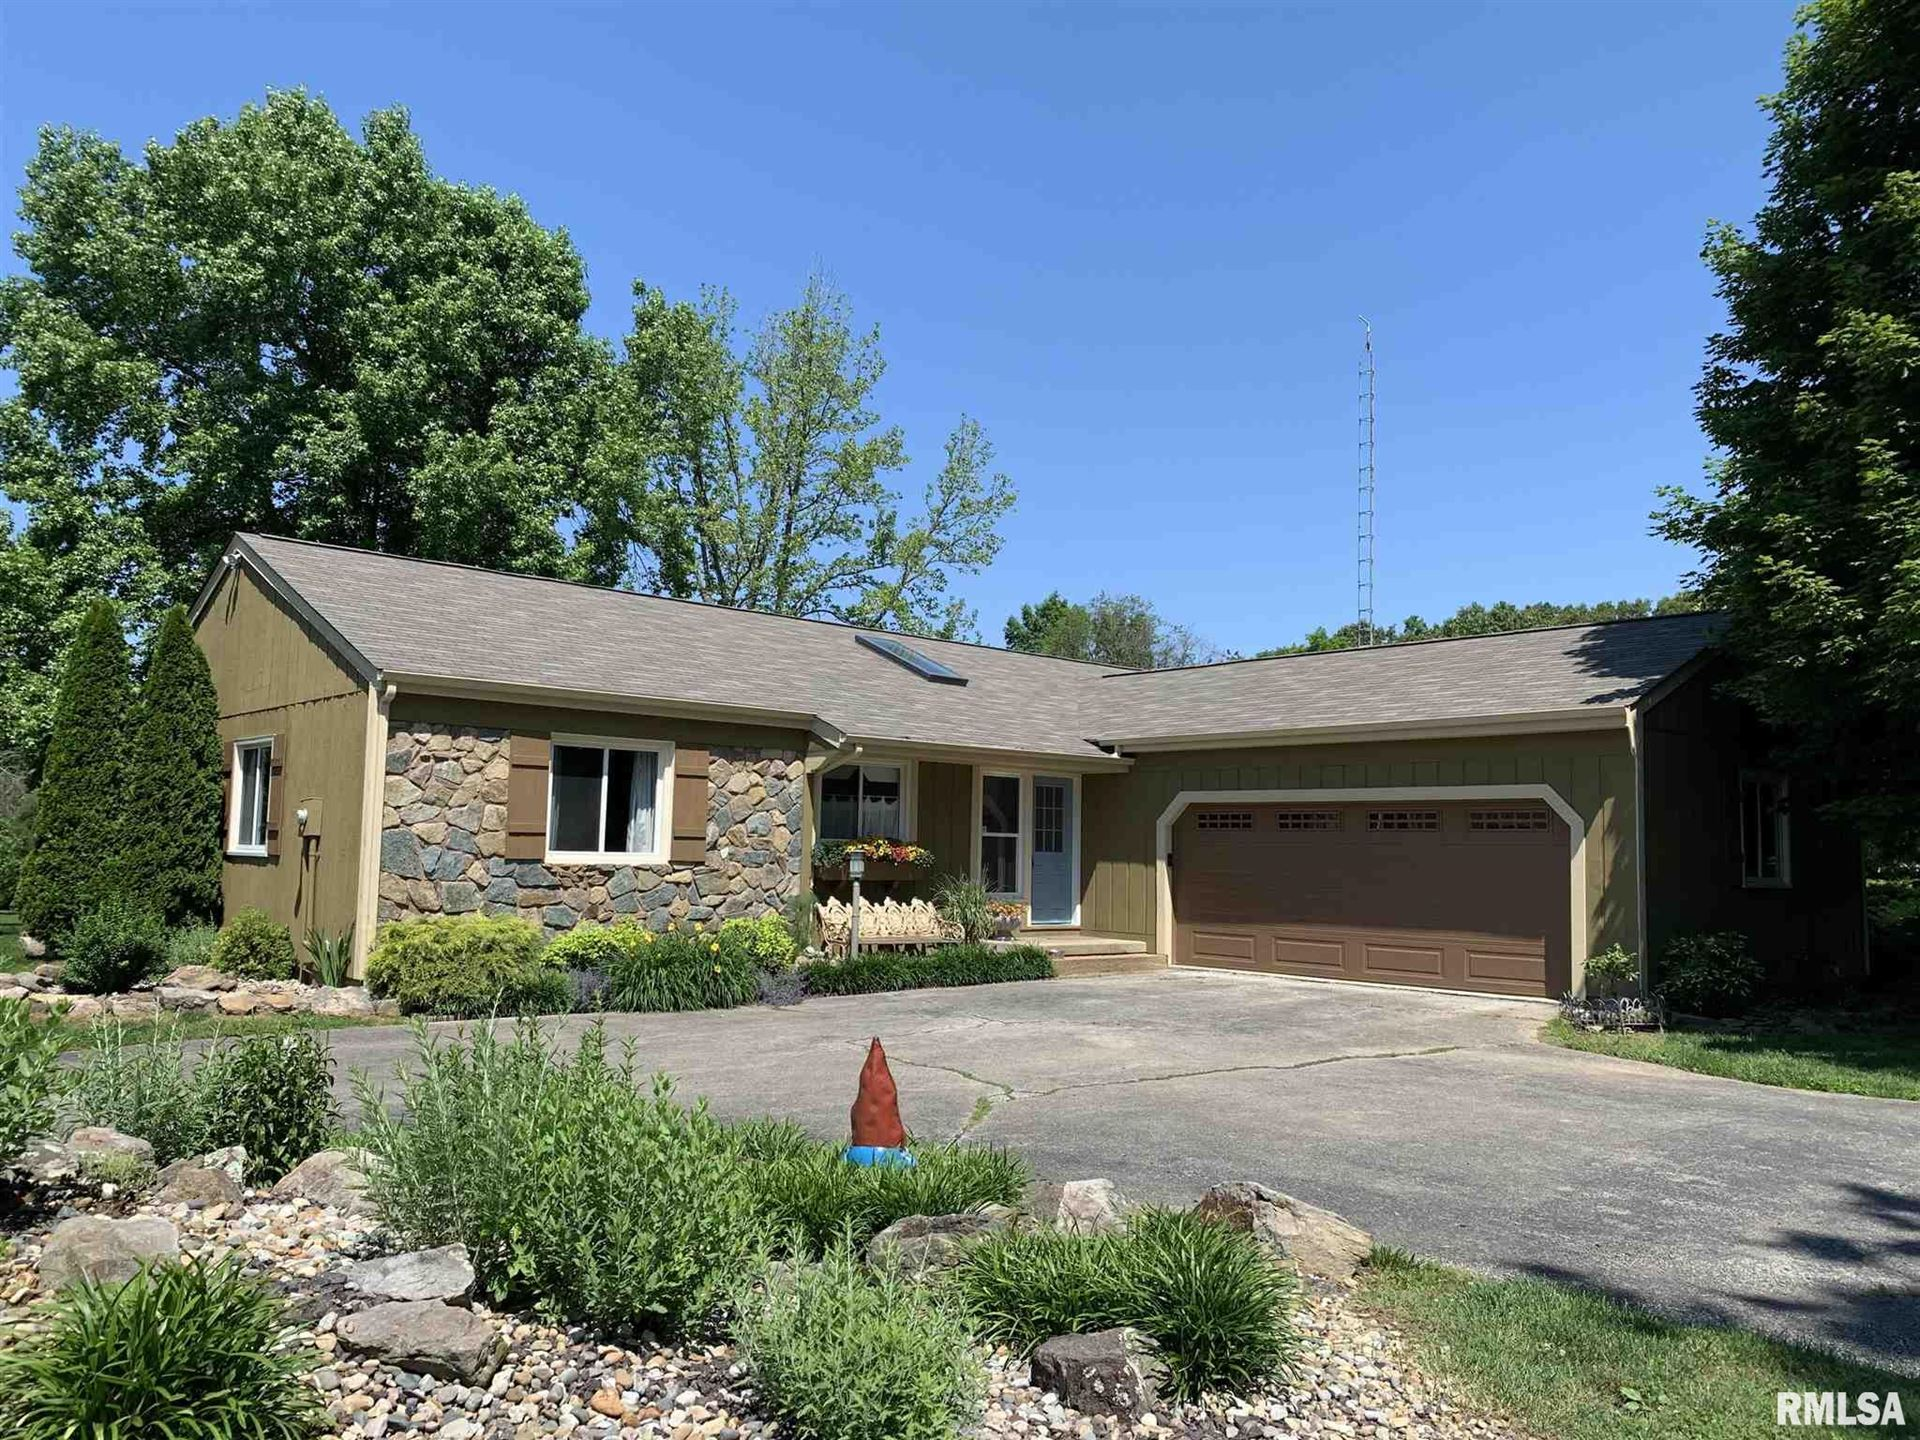 17649 N County Farm, Mount Vernon, IL 62864 - MLS#: EB439765